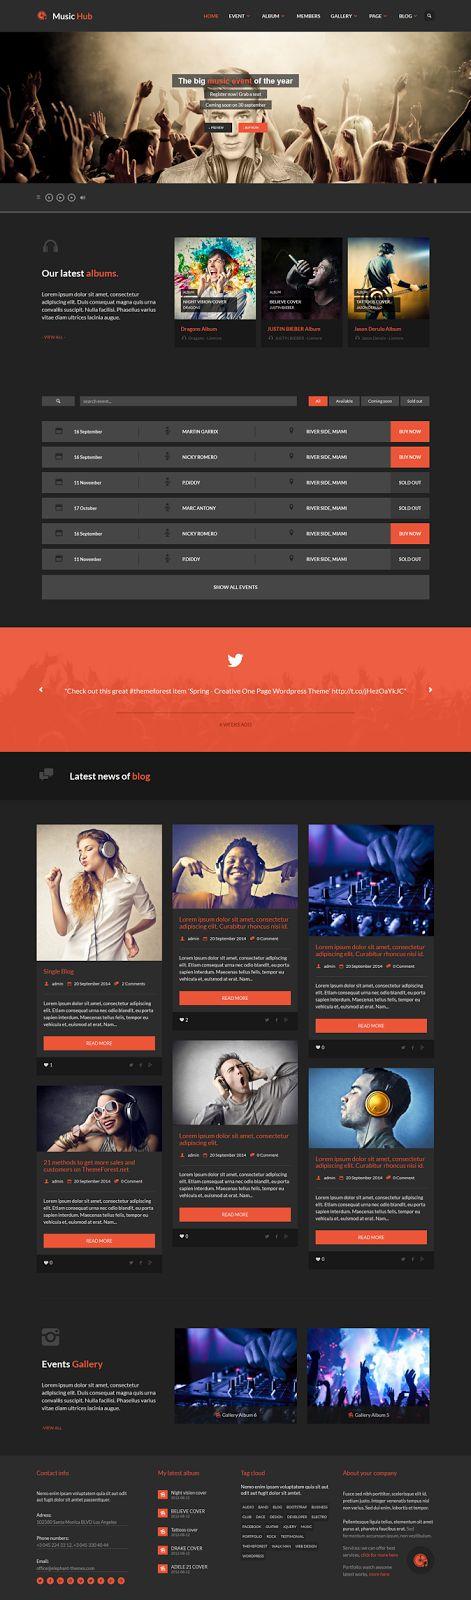 MusicHub Music Band Club Party WordPress Theme #Music #artists #webdesign